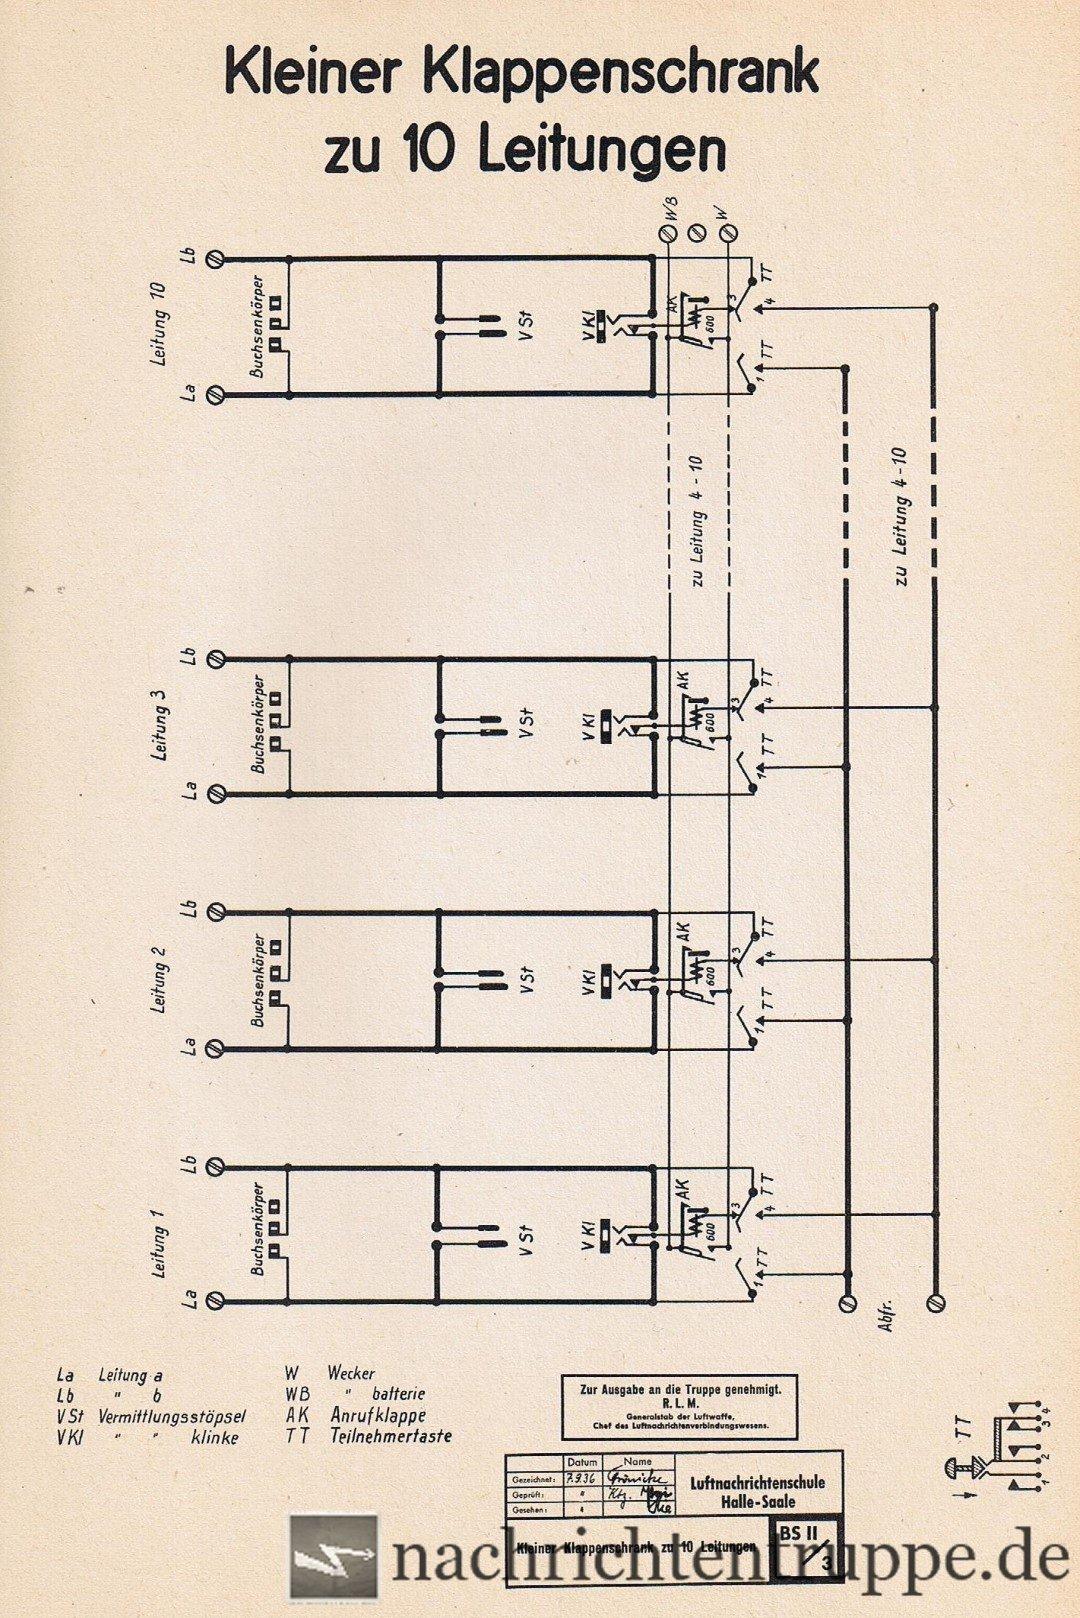 Charmant 280z Schaltplan Fotos - Schaltplan Serie Circuit Collection ...